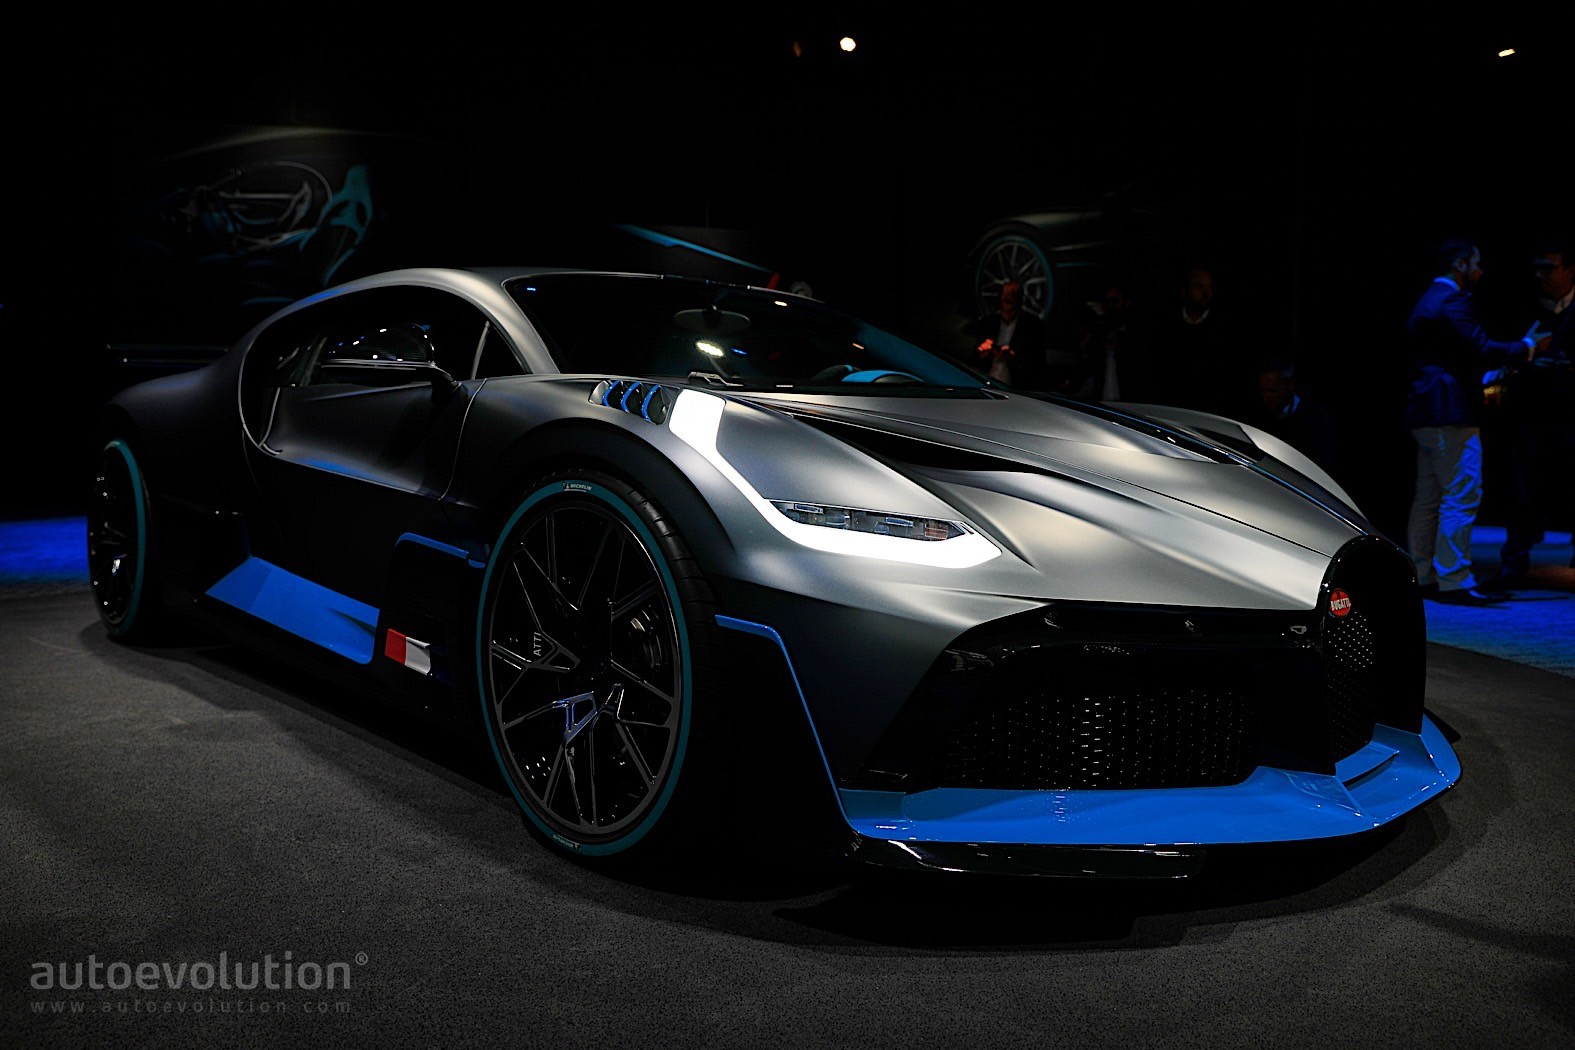 Bugatti Divo Has Spectacular Crash, Only as a Rendering ... Bugatti Divo